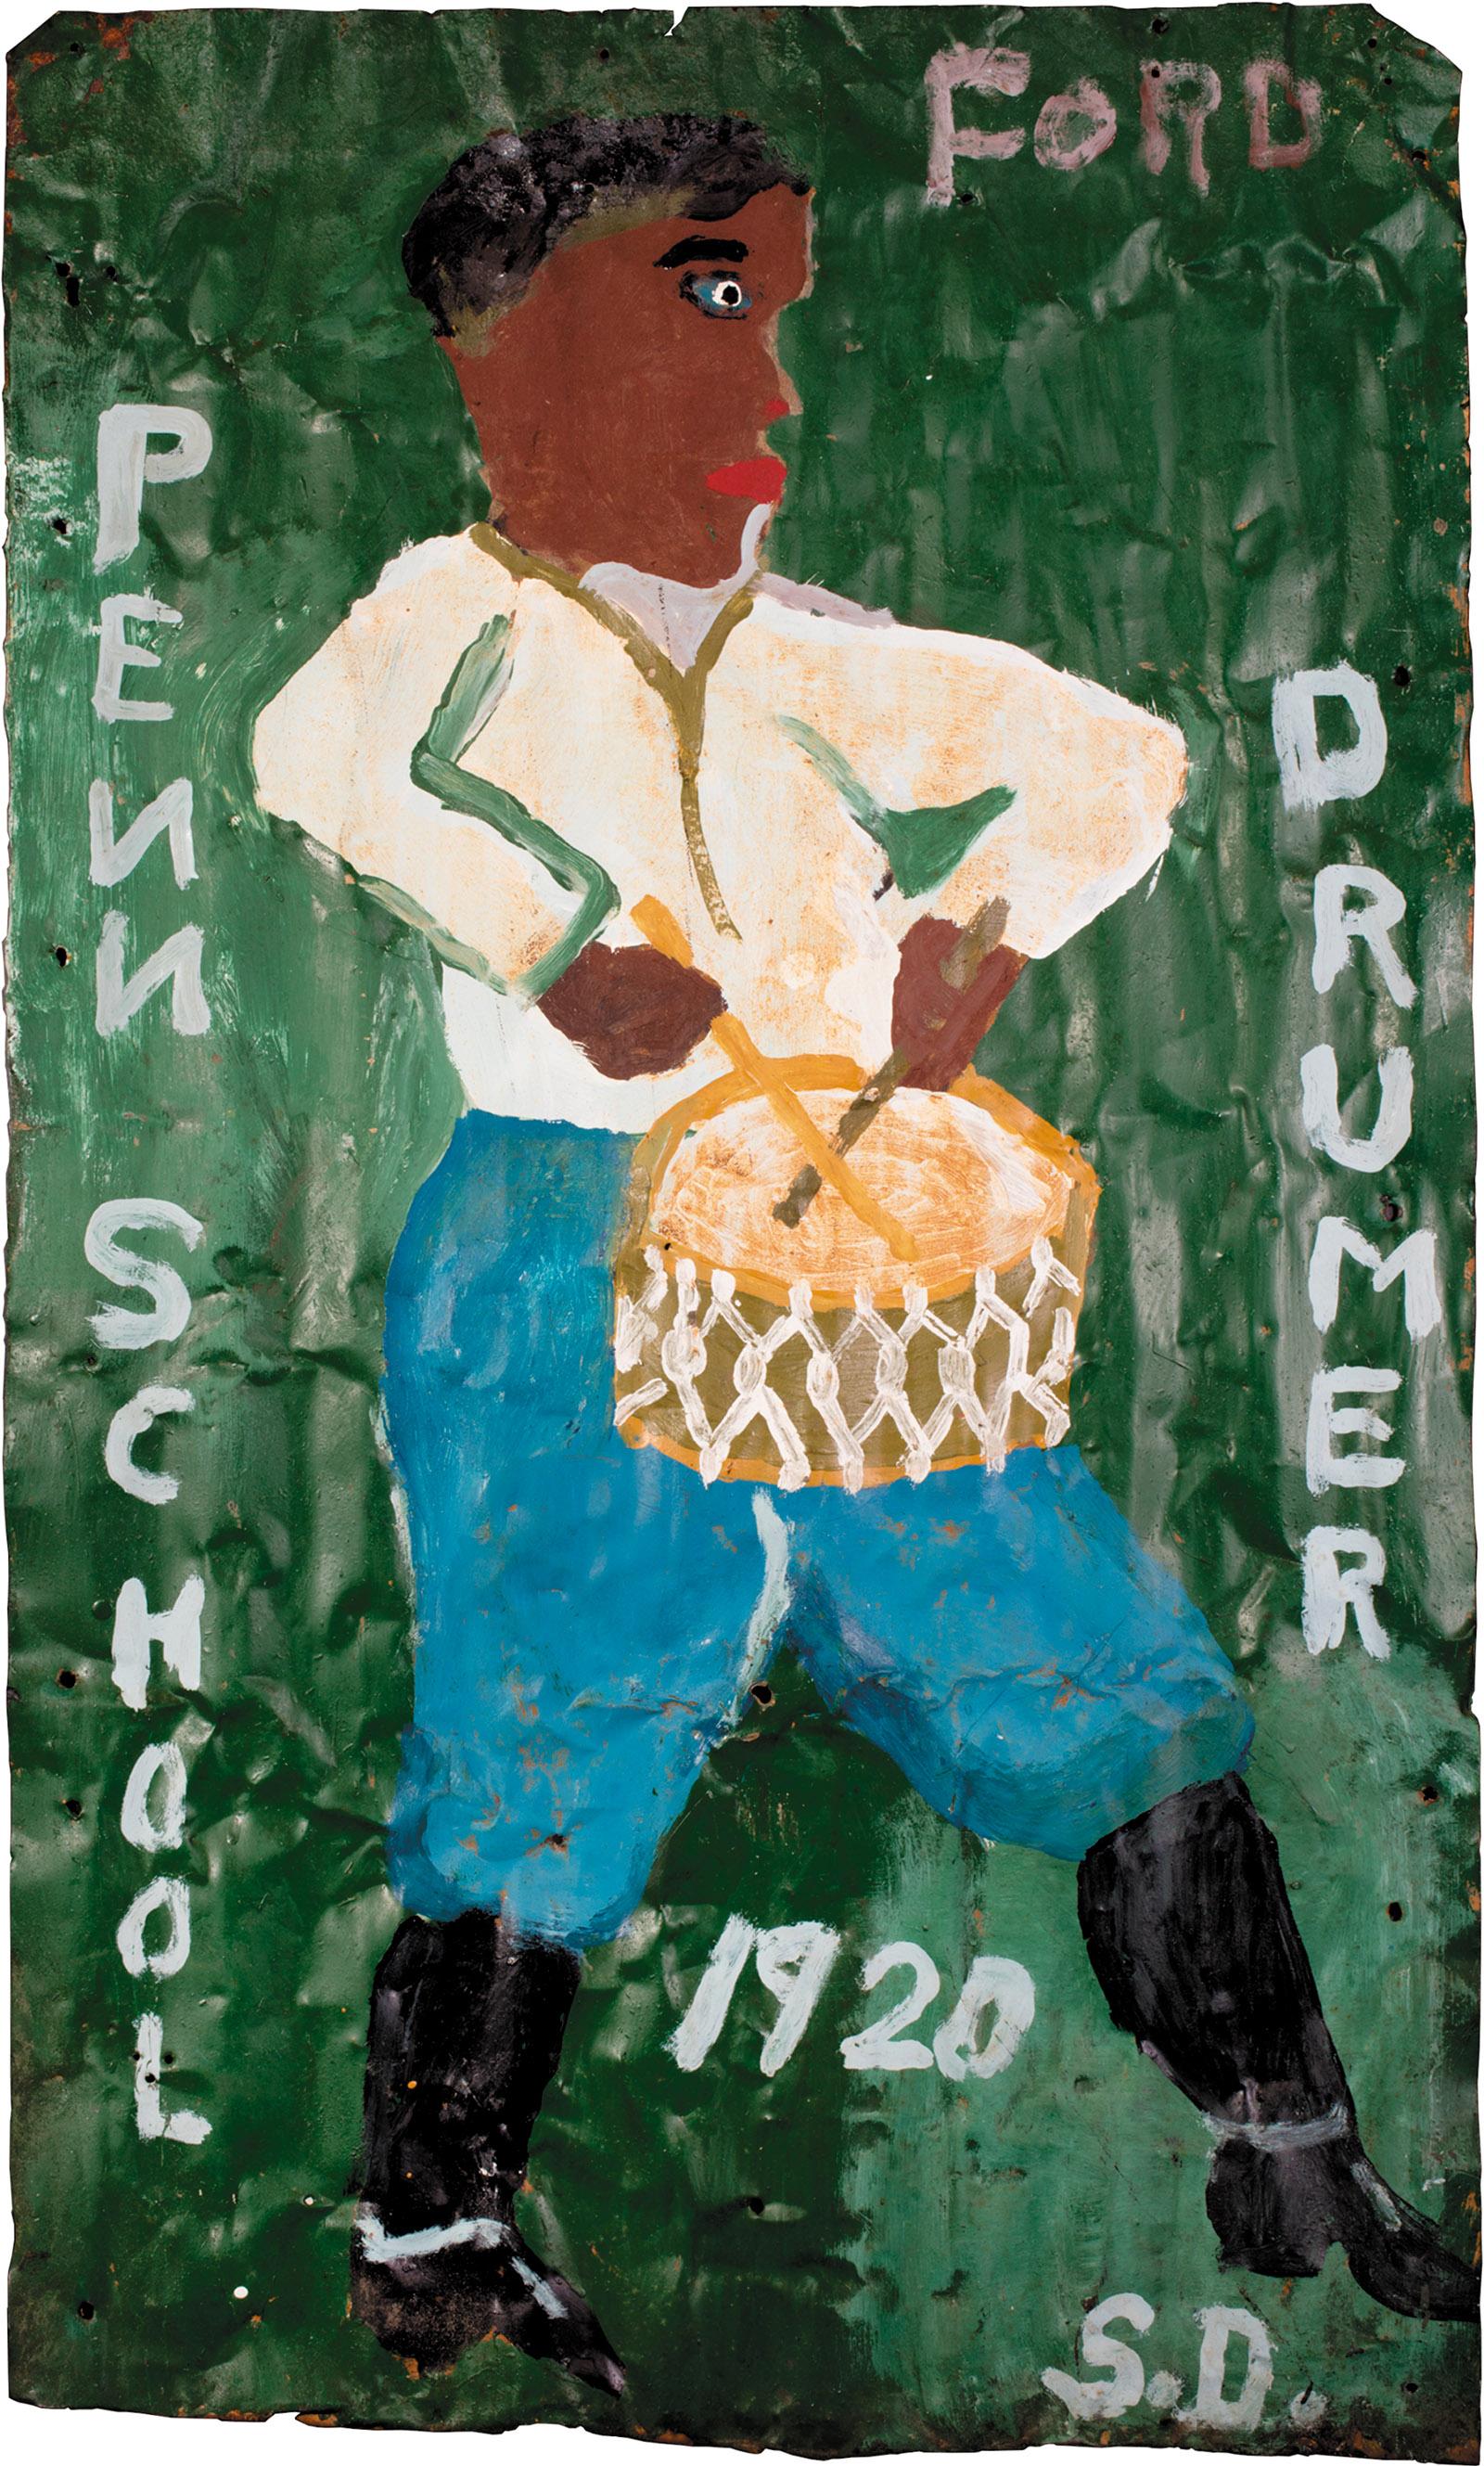 Penn School Drumer 1920; painting by Sam Doyle